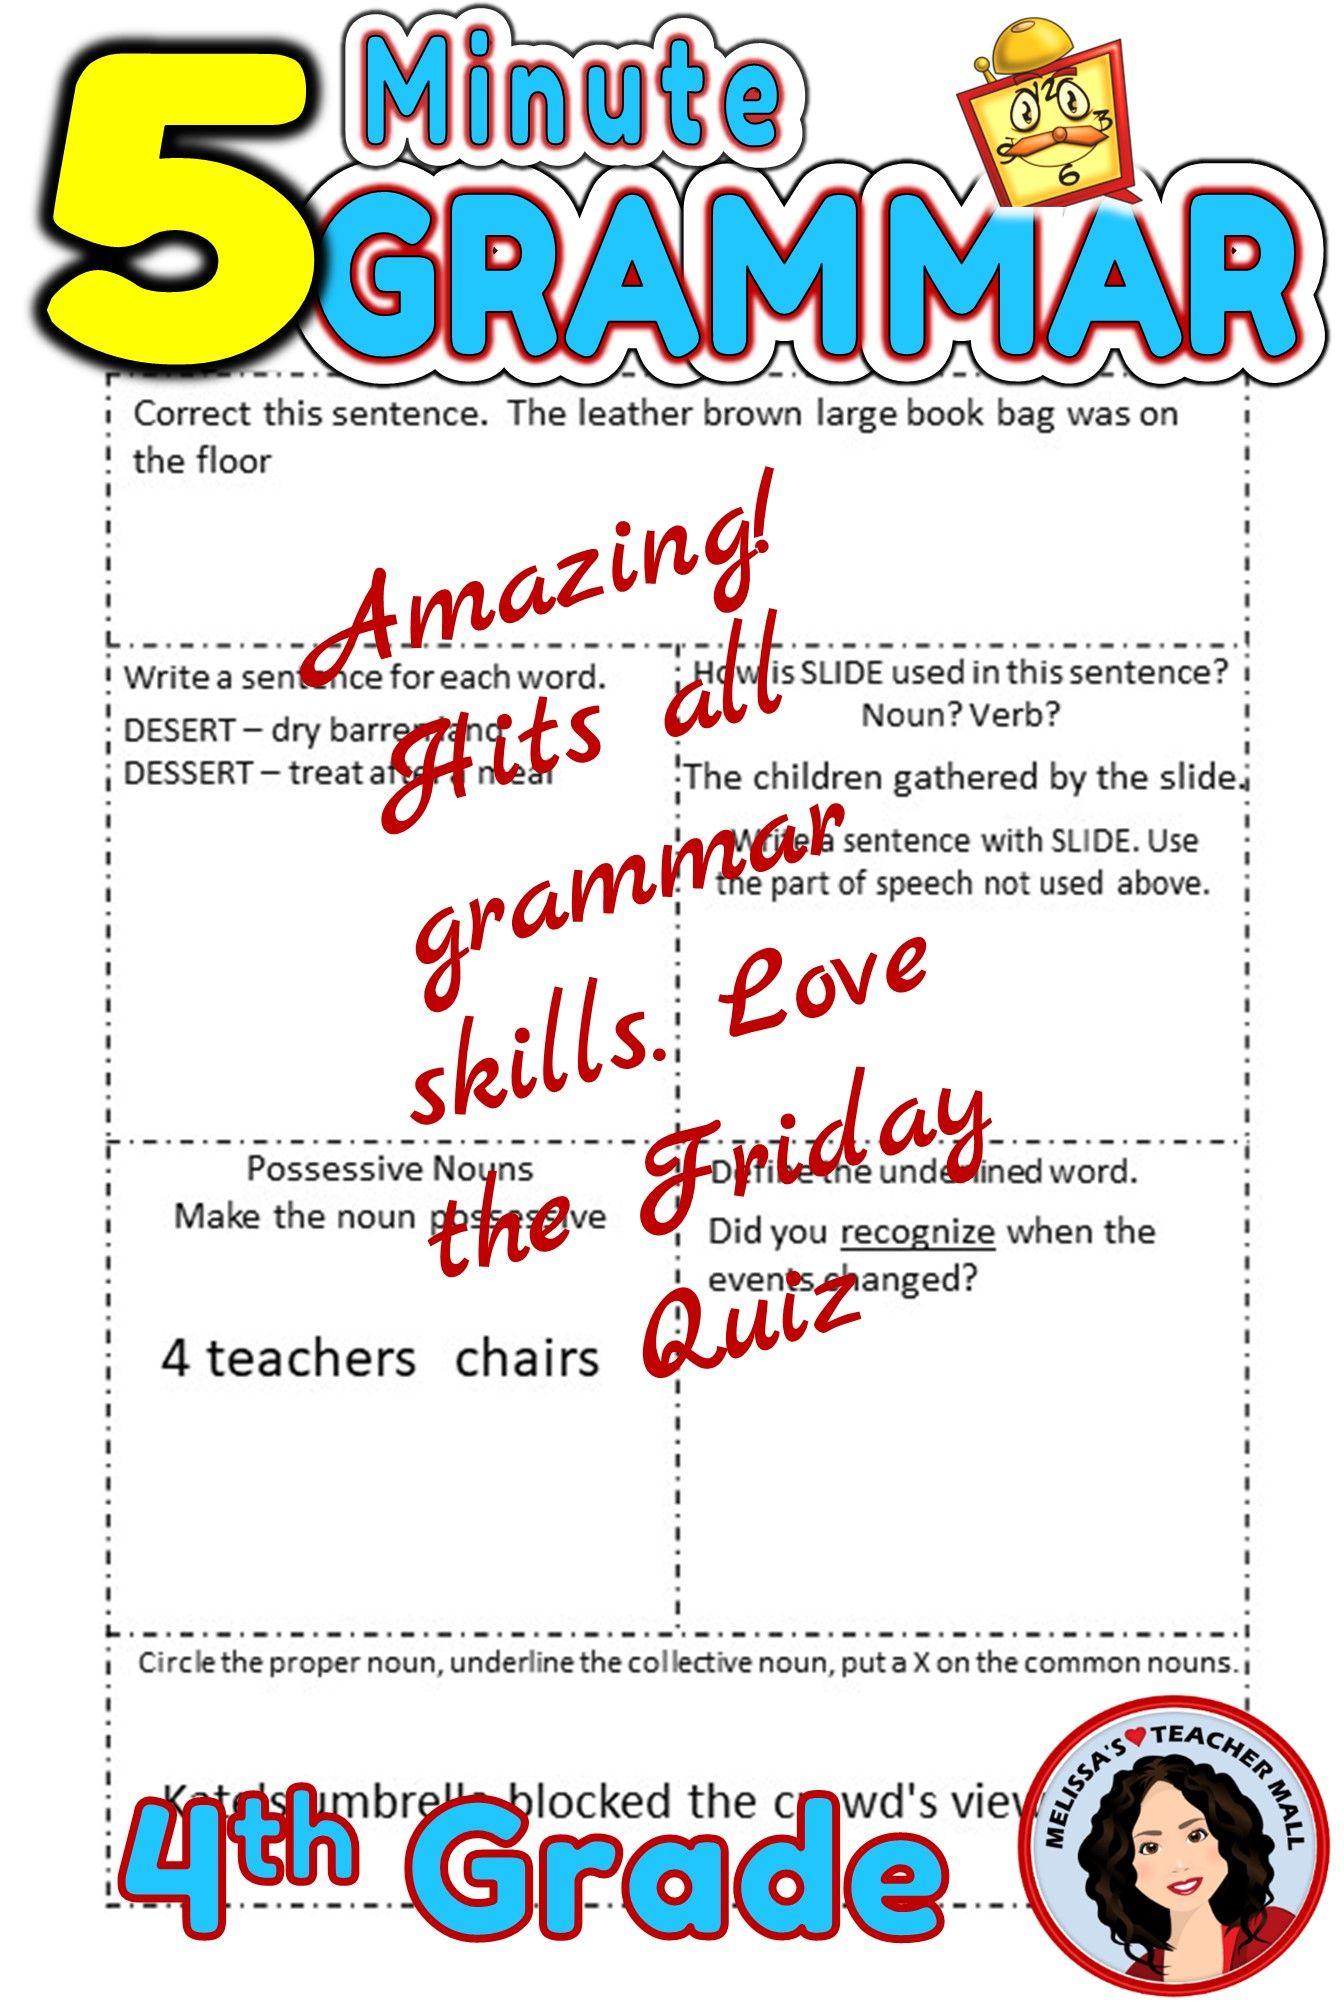 5 Minute Grammar Daily Grammar Worksheets 4th Grade